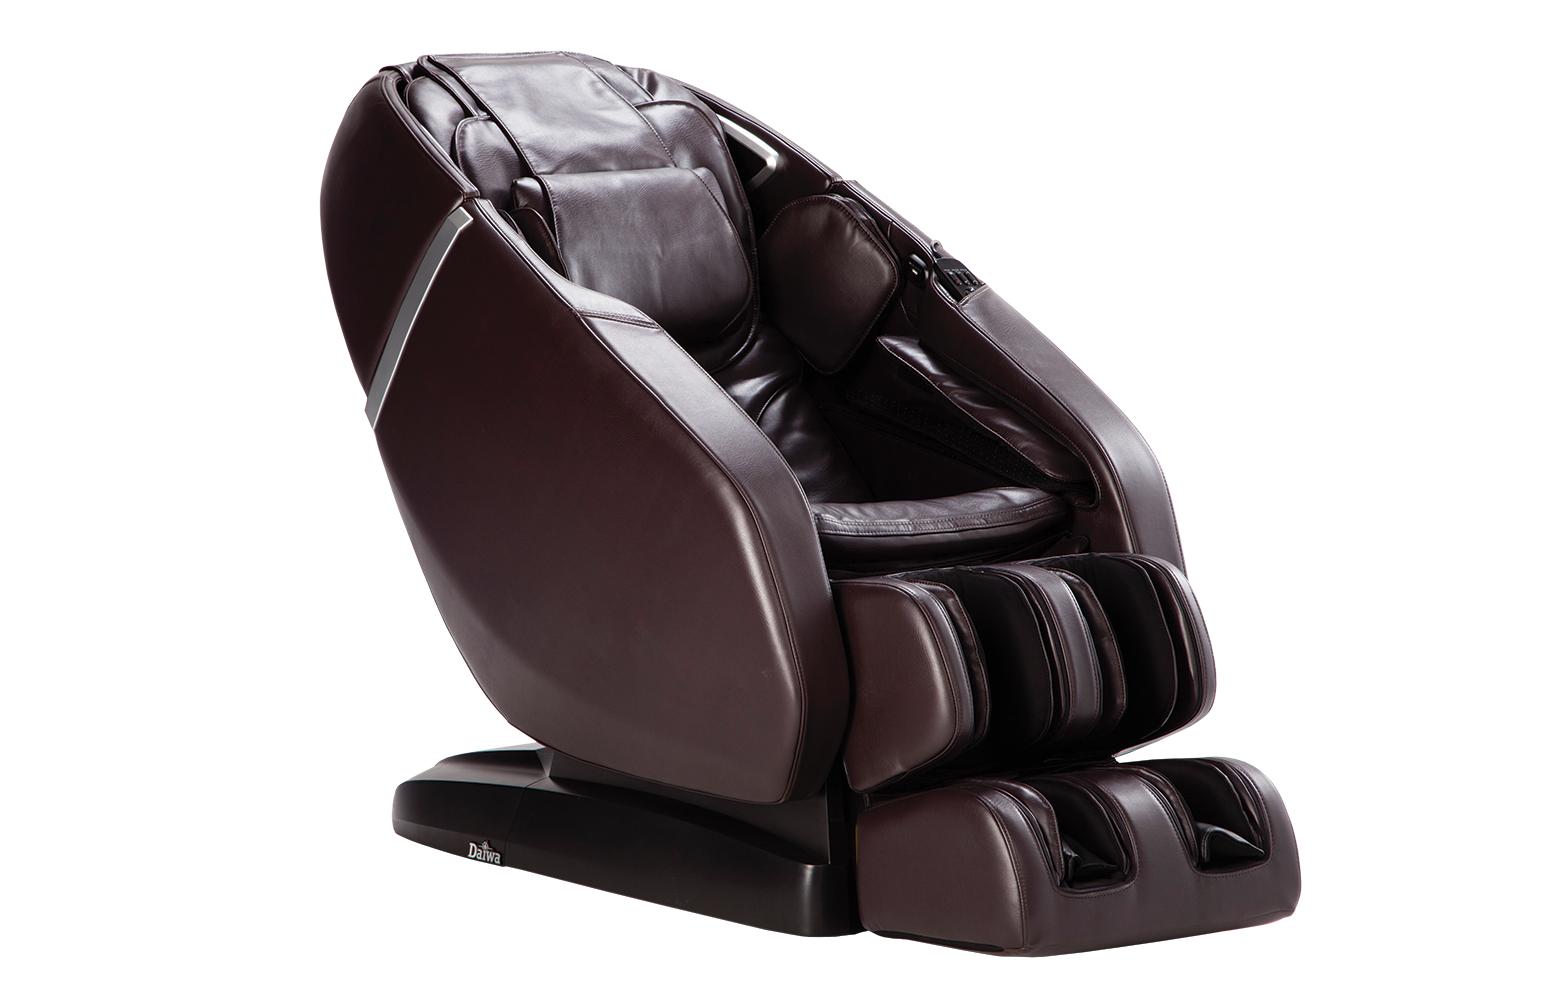 Brown Majesty Massage Chair